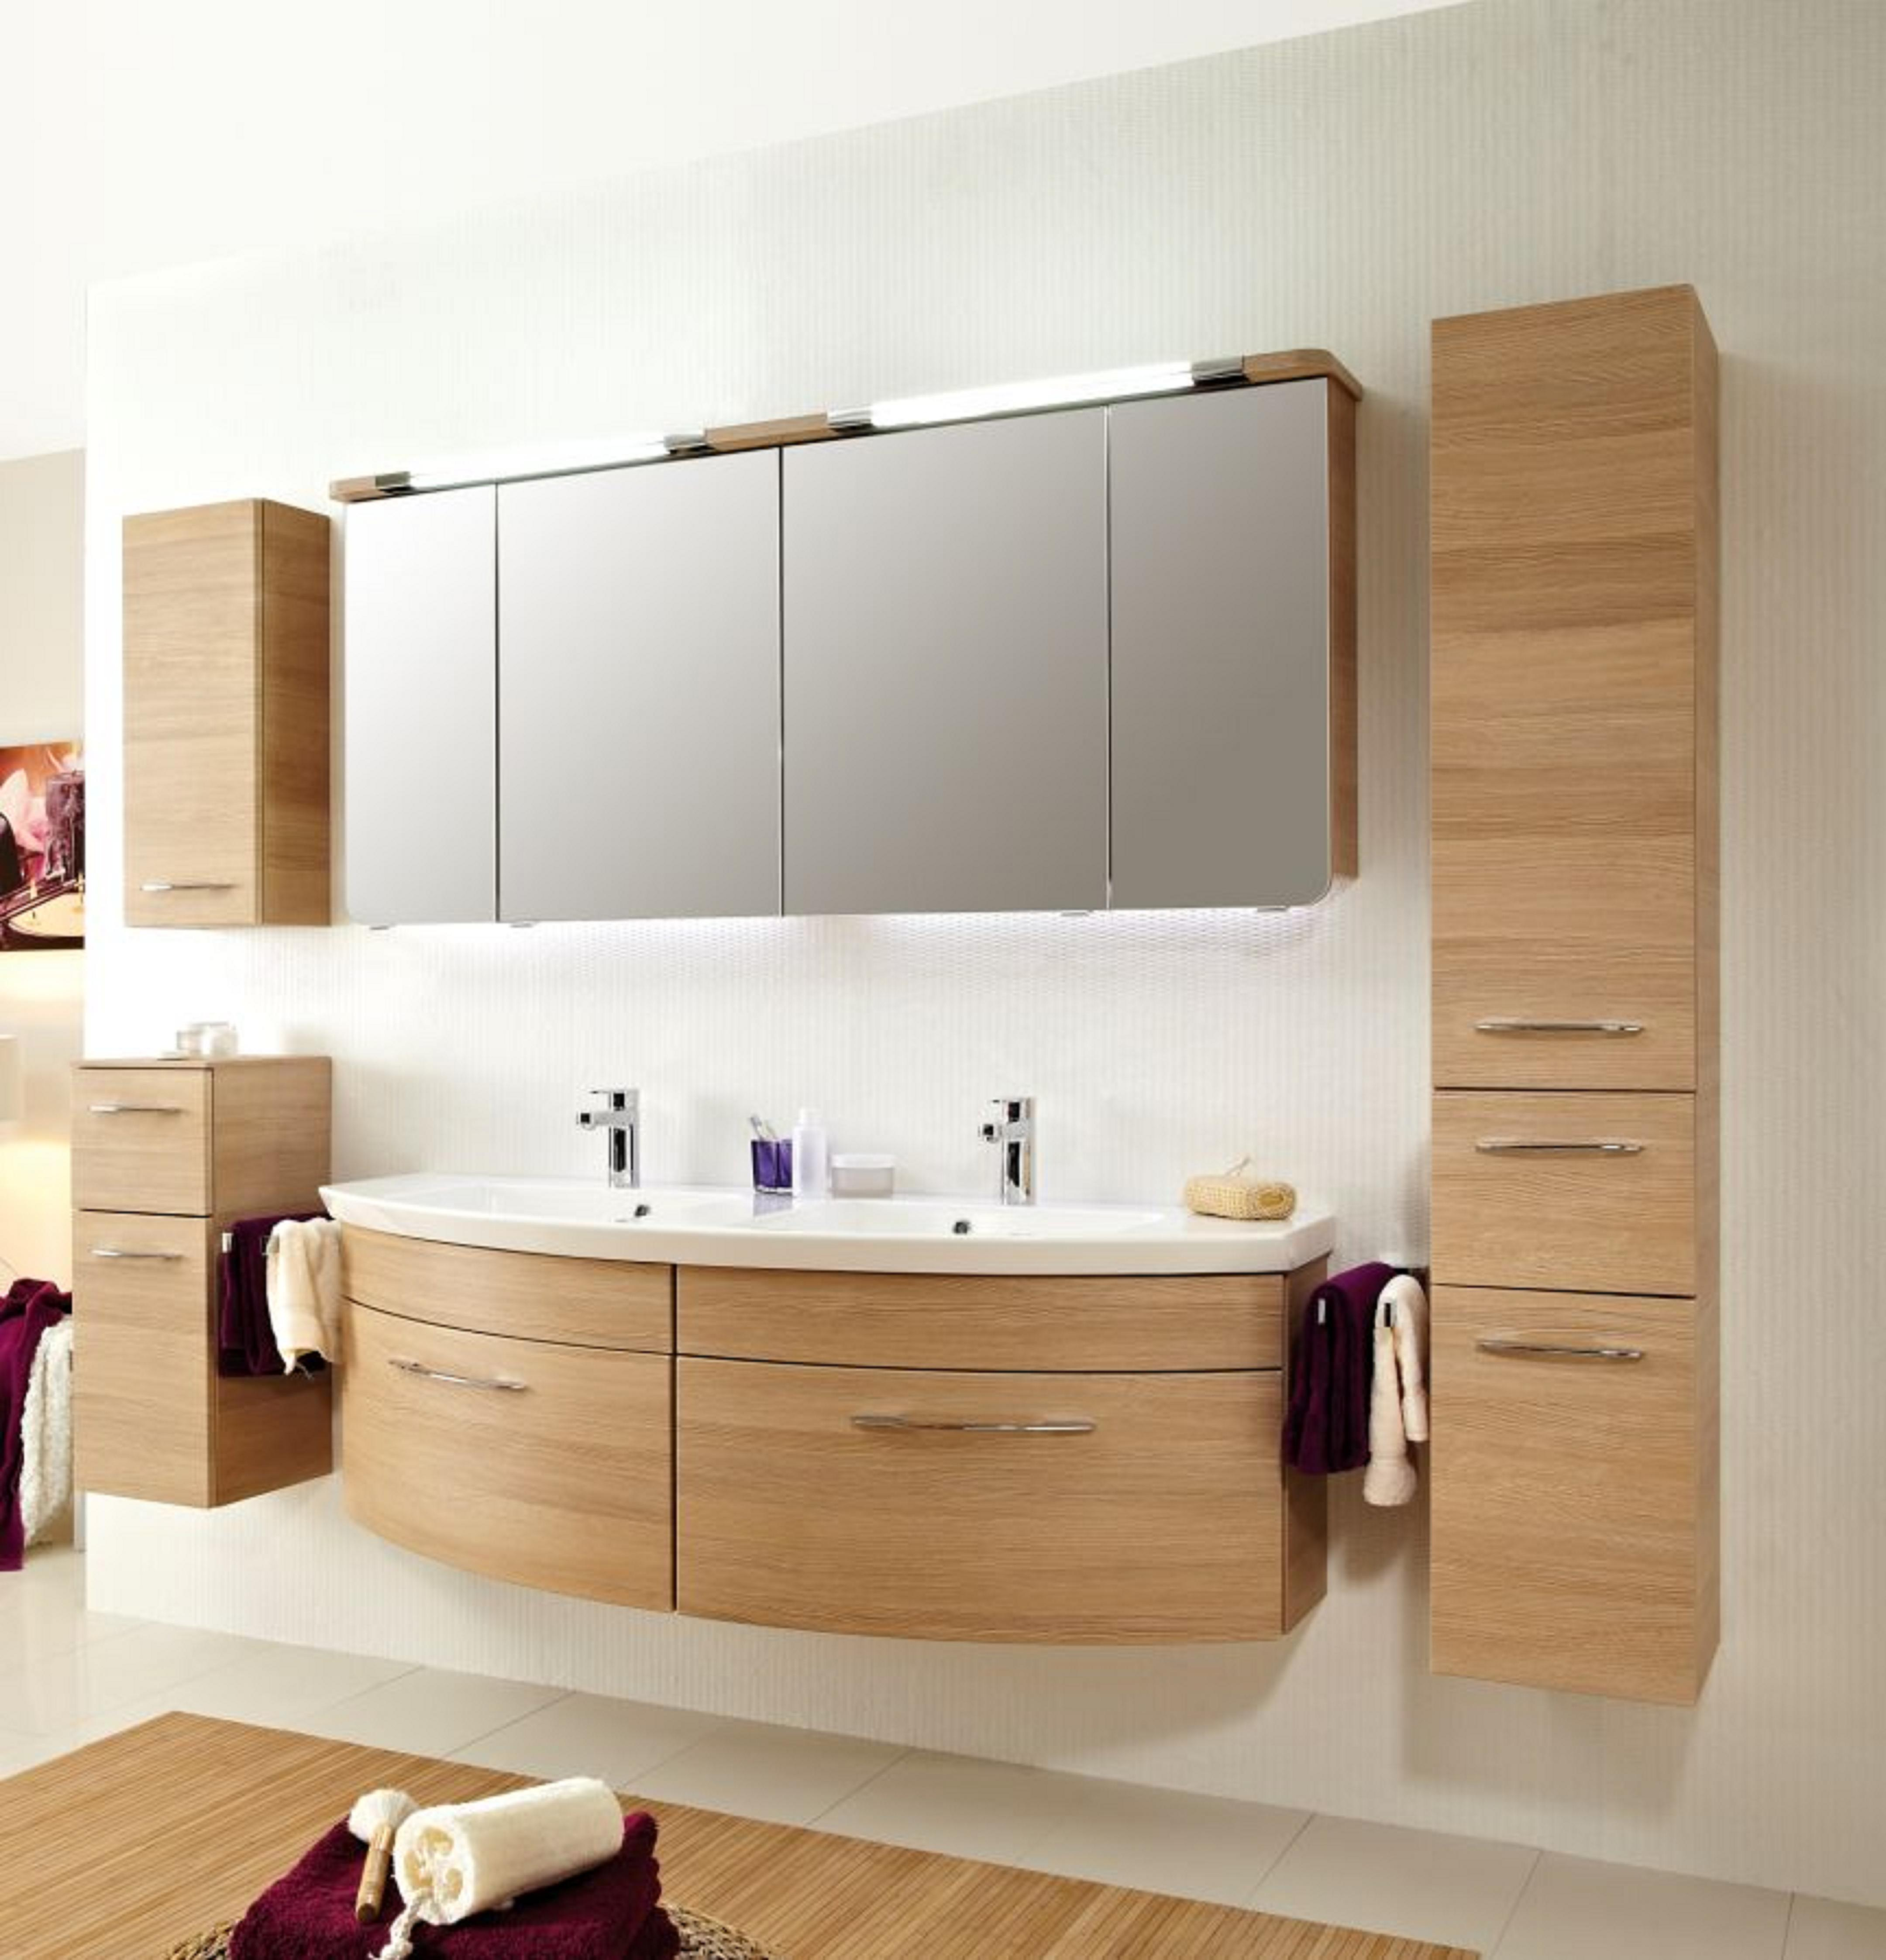 Pelipal Cassca Block 153 cm - Konfigurator günstig kaufen | Möbel ...